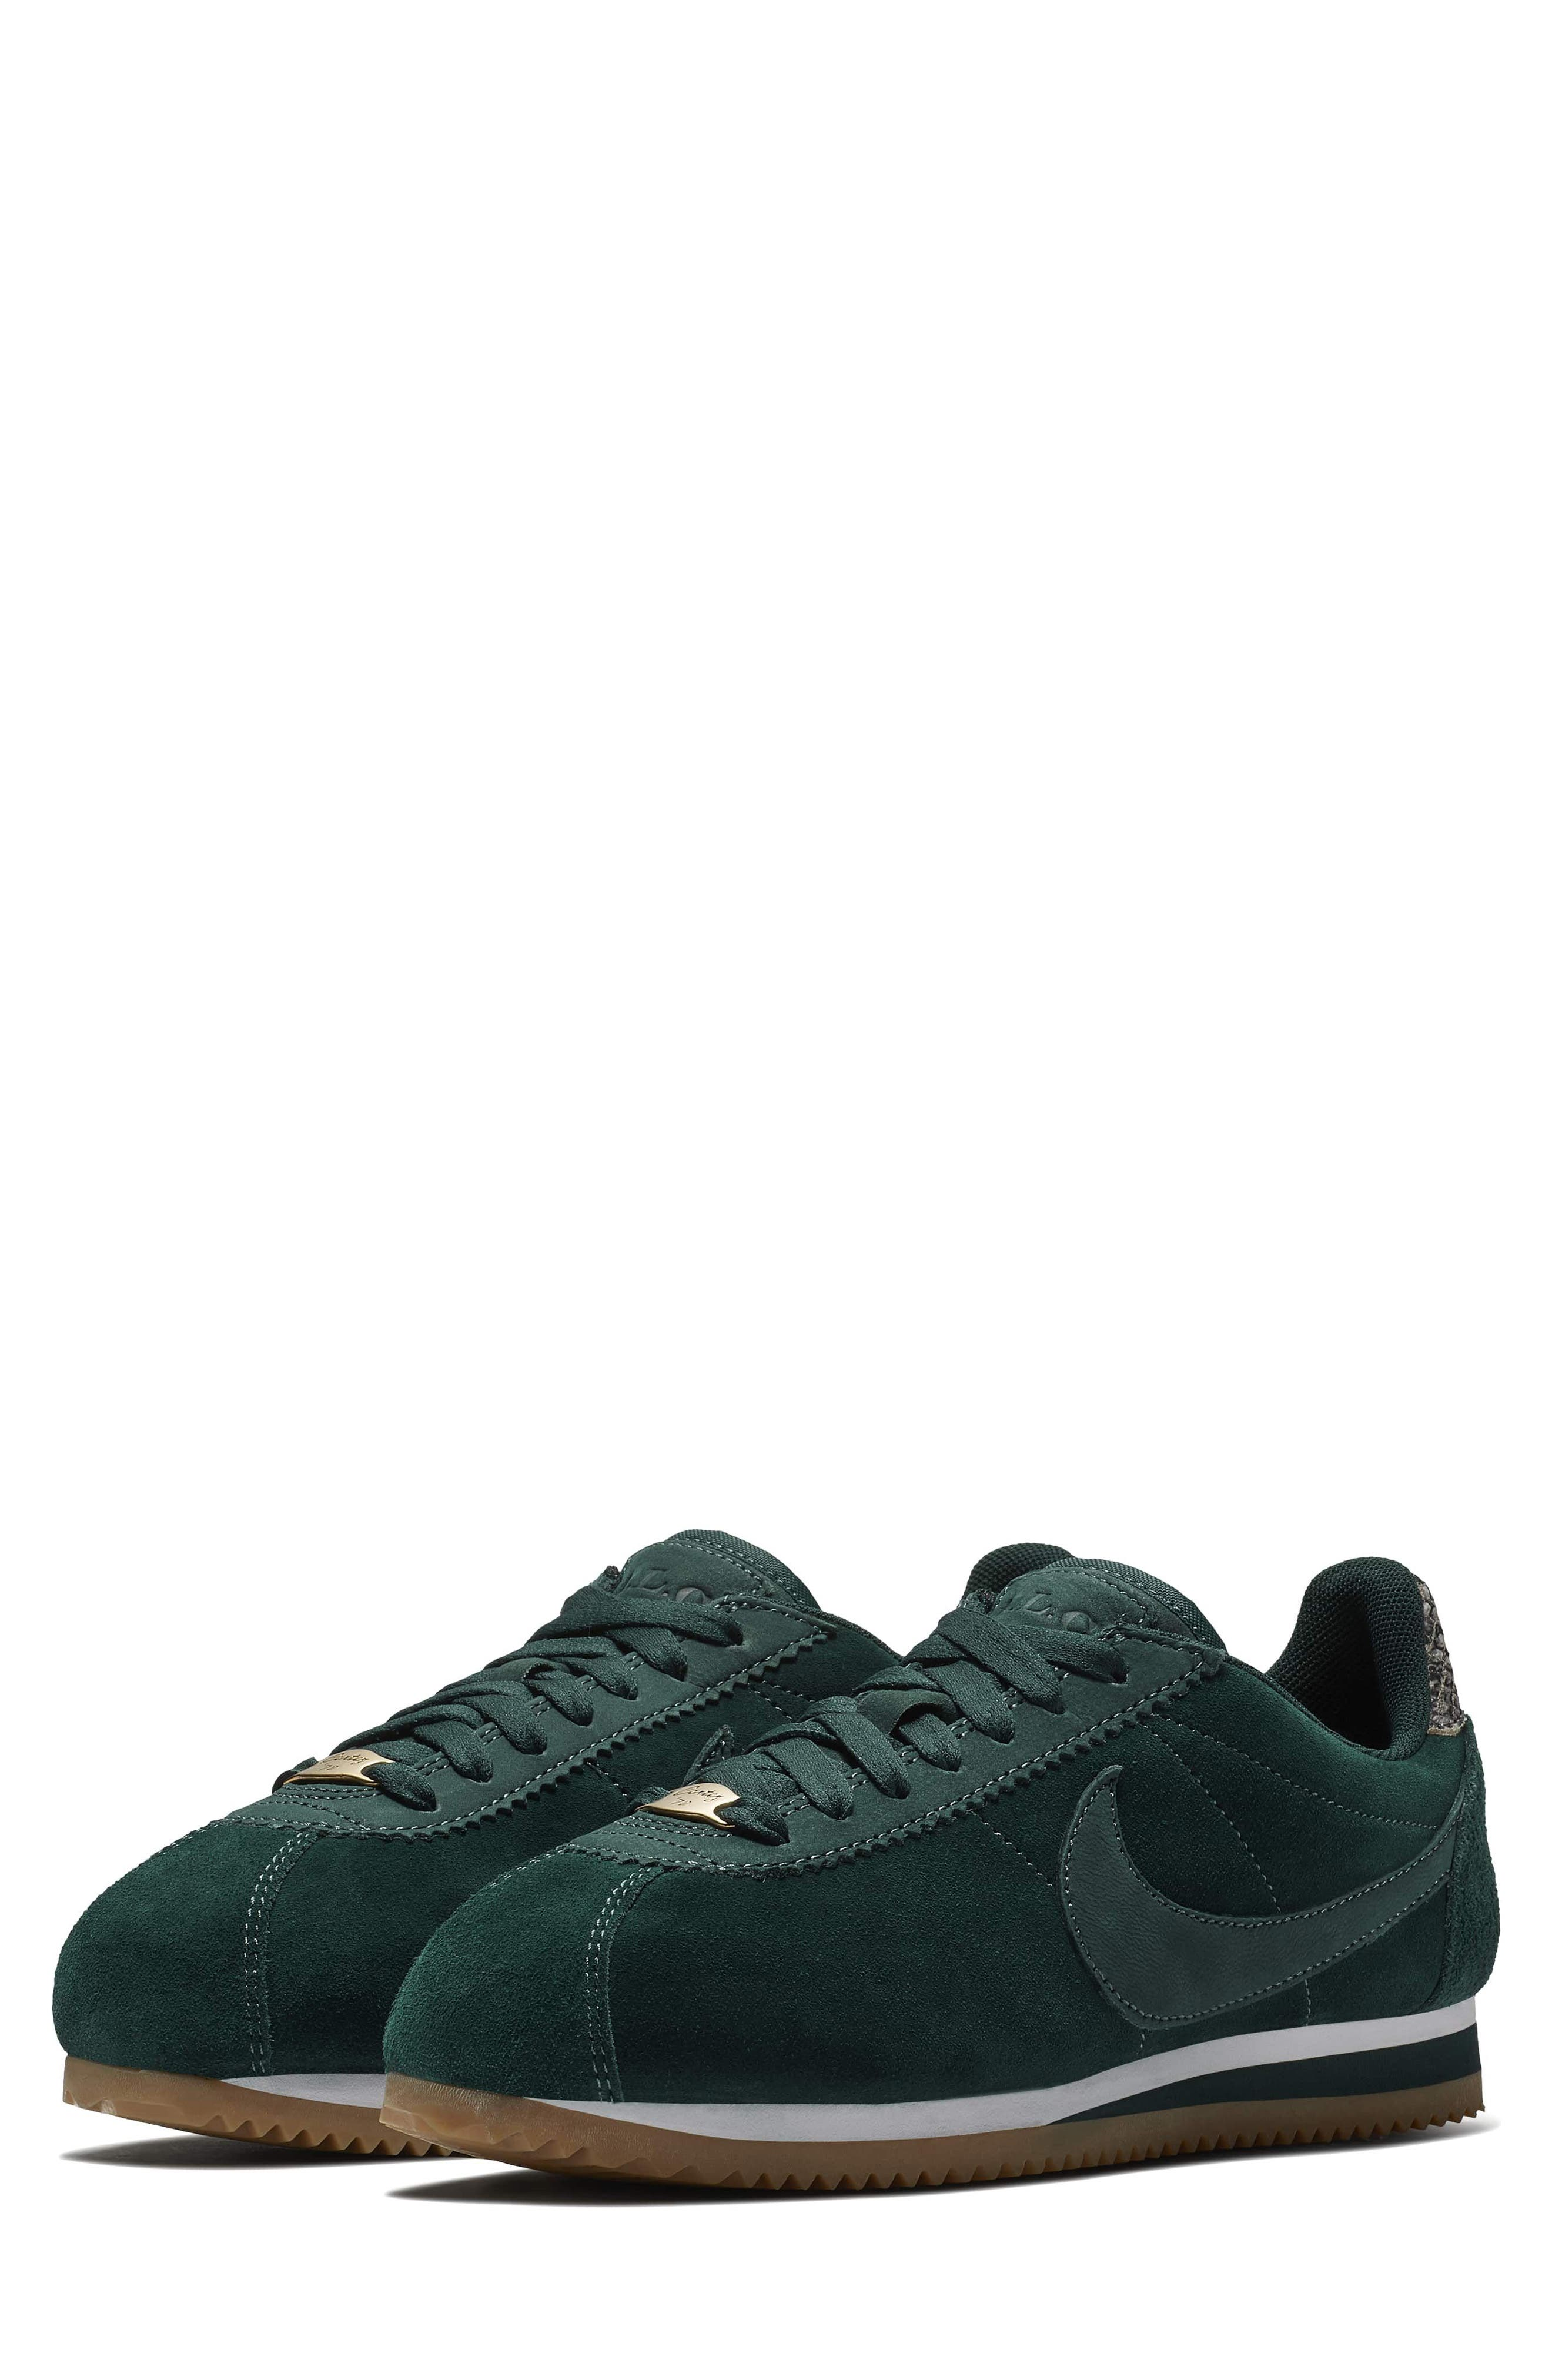 x A.L.C. Classic Cortez Sneaker,                             Main thumbnail 1, color,                             Midnight Spruce/ White